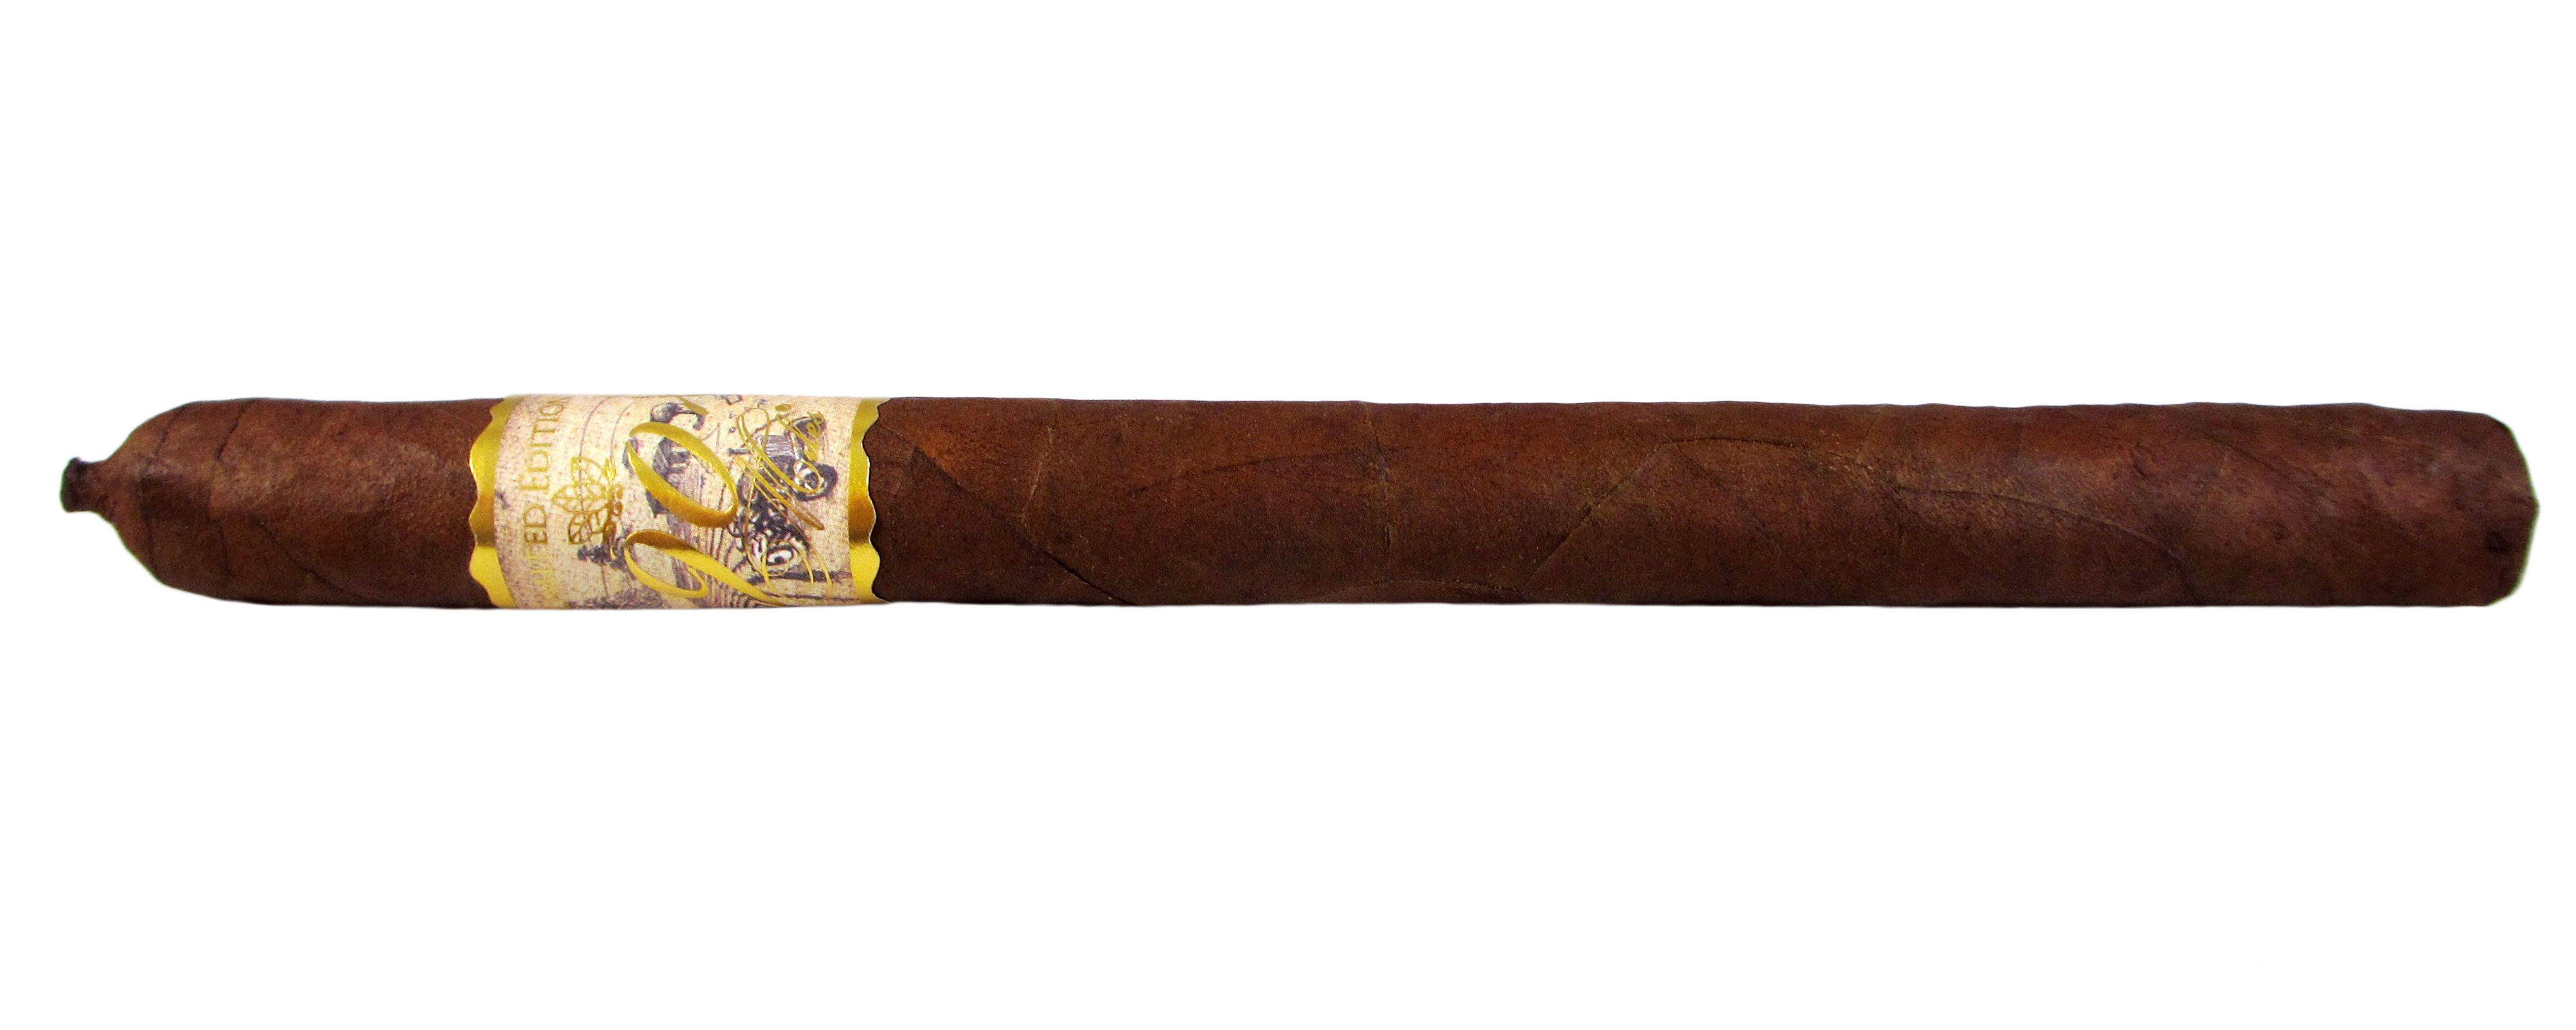 Blind Cigar Review: Flor de Gonzalez   90 Miles Nicaragua RA